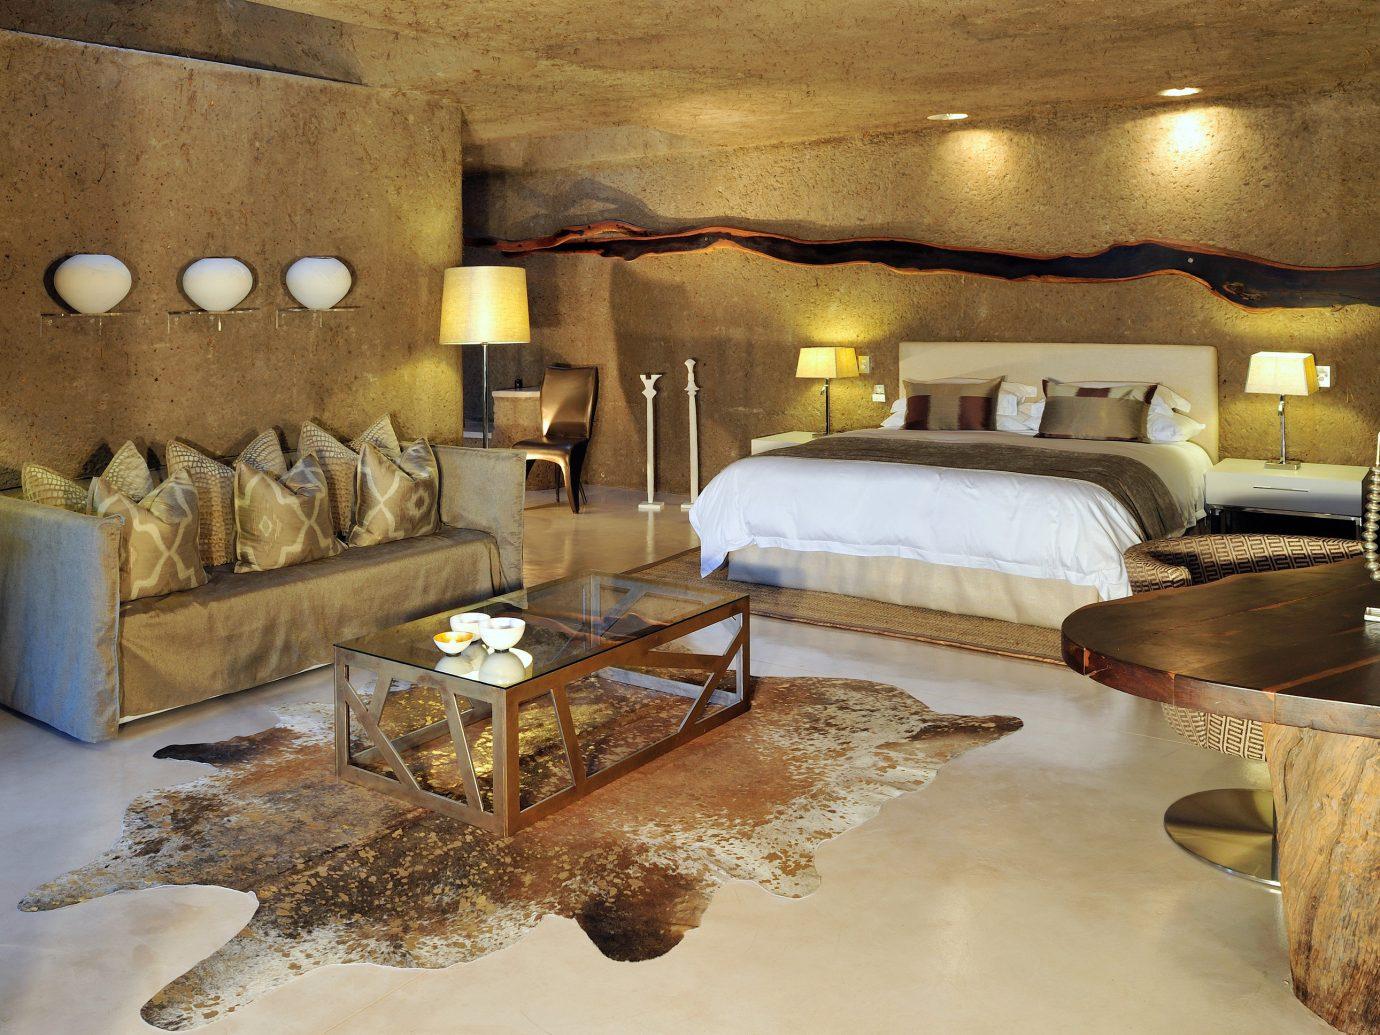 Hotels Luxury Travel indoor room property estate living room floor interior design Lobby home Design furniture mansion several